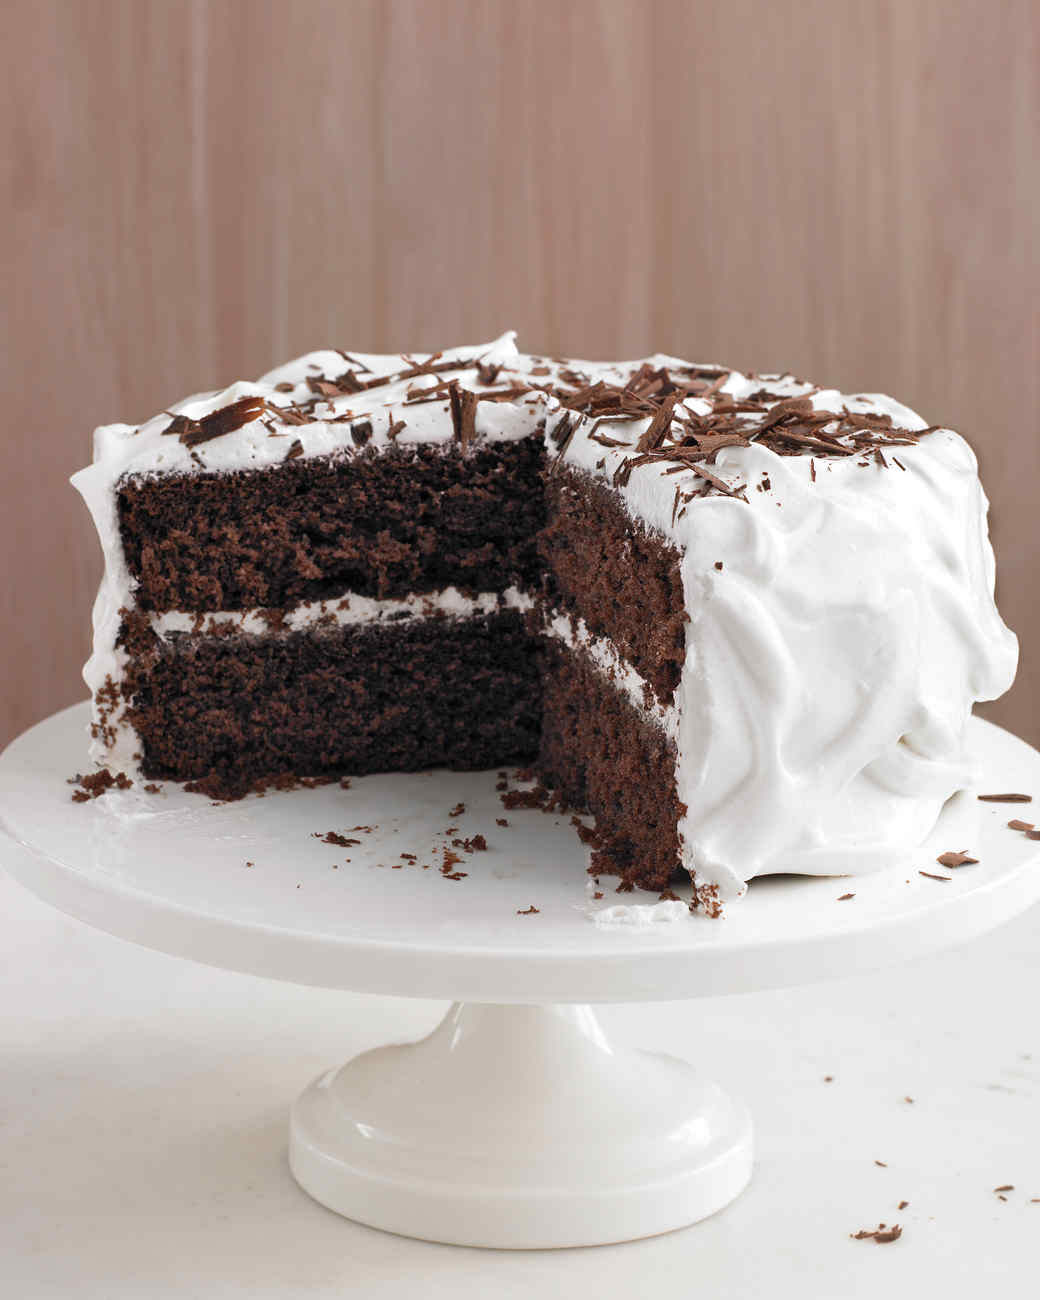 Buttermilk chocolate cake recipe martha stewart